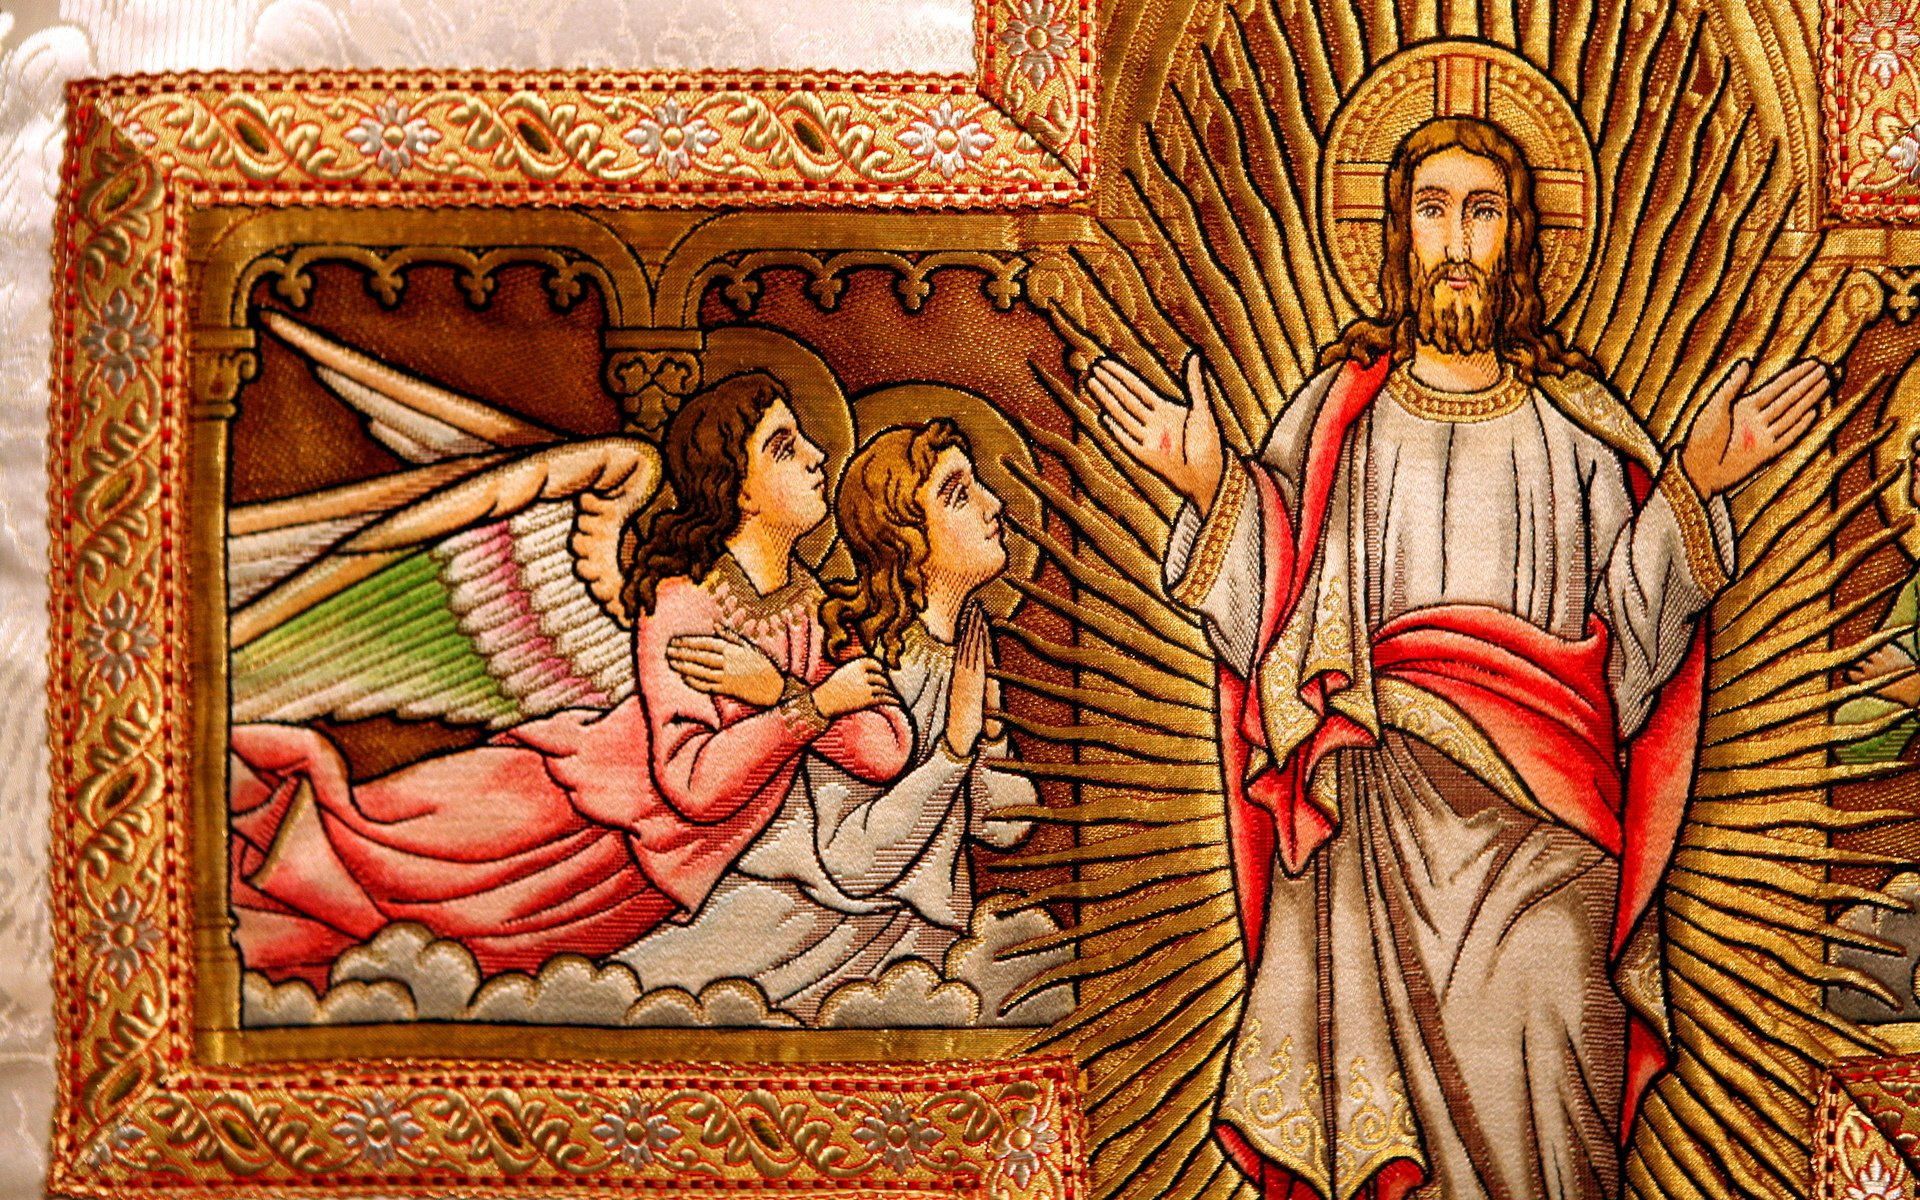 Religioso - Catholic  Jesus Christ Savior God Sfondo